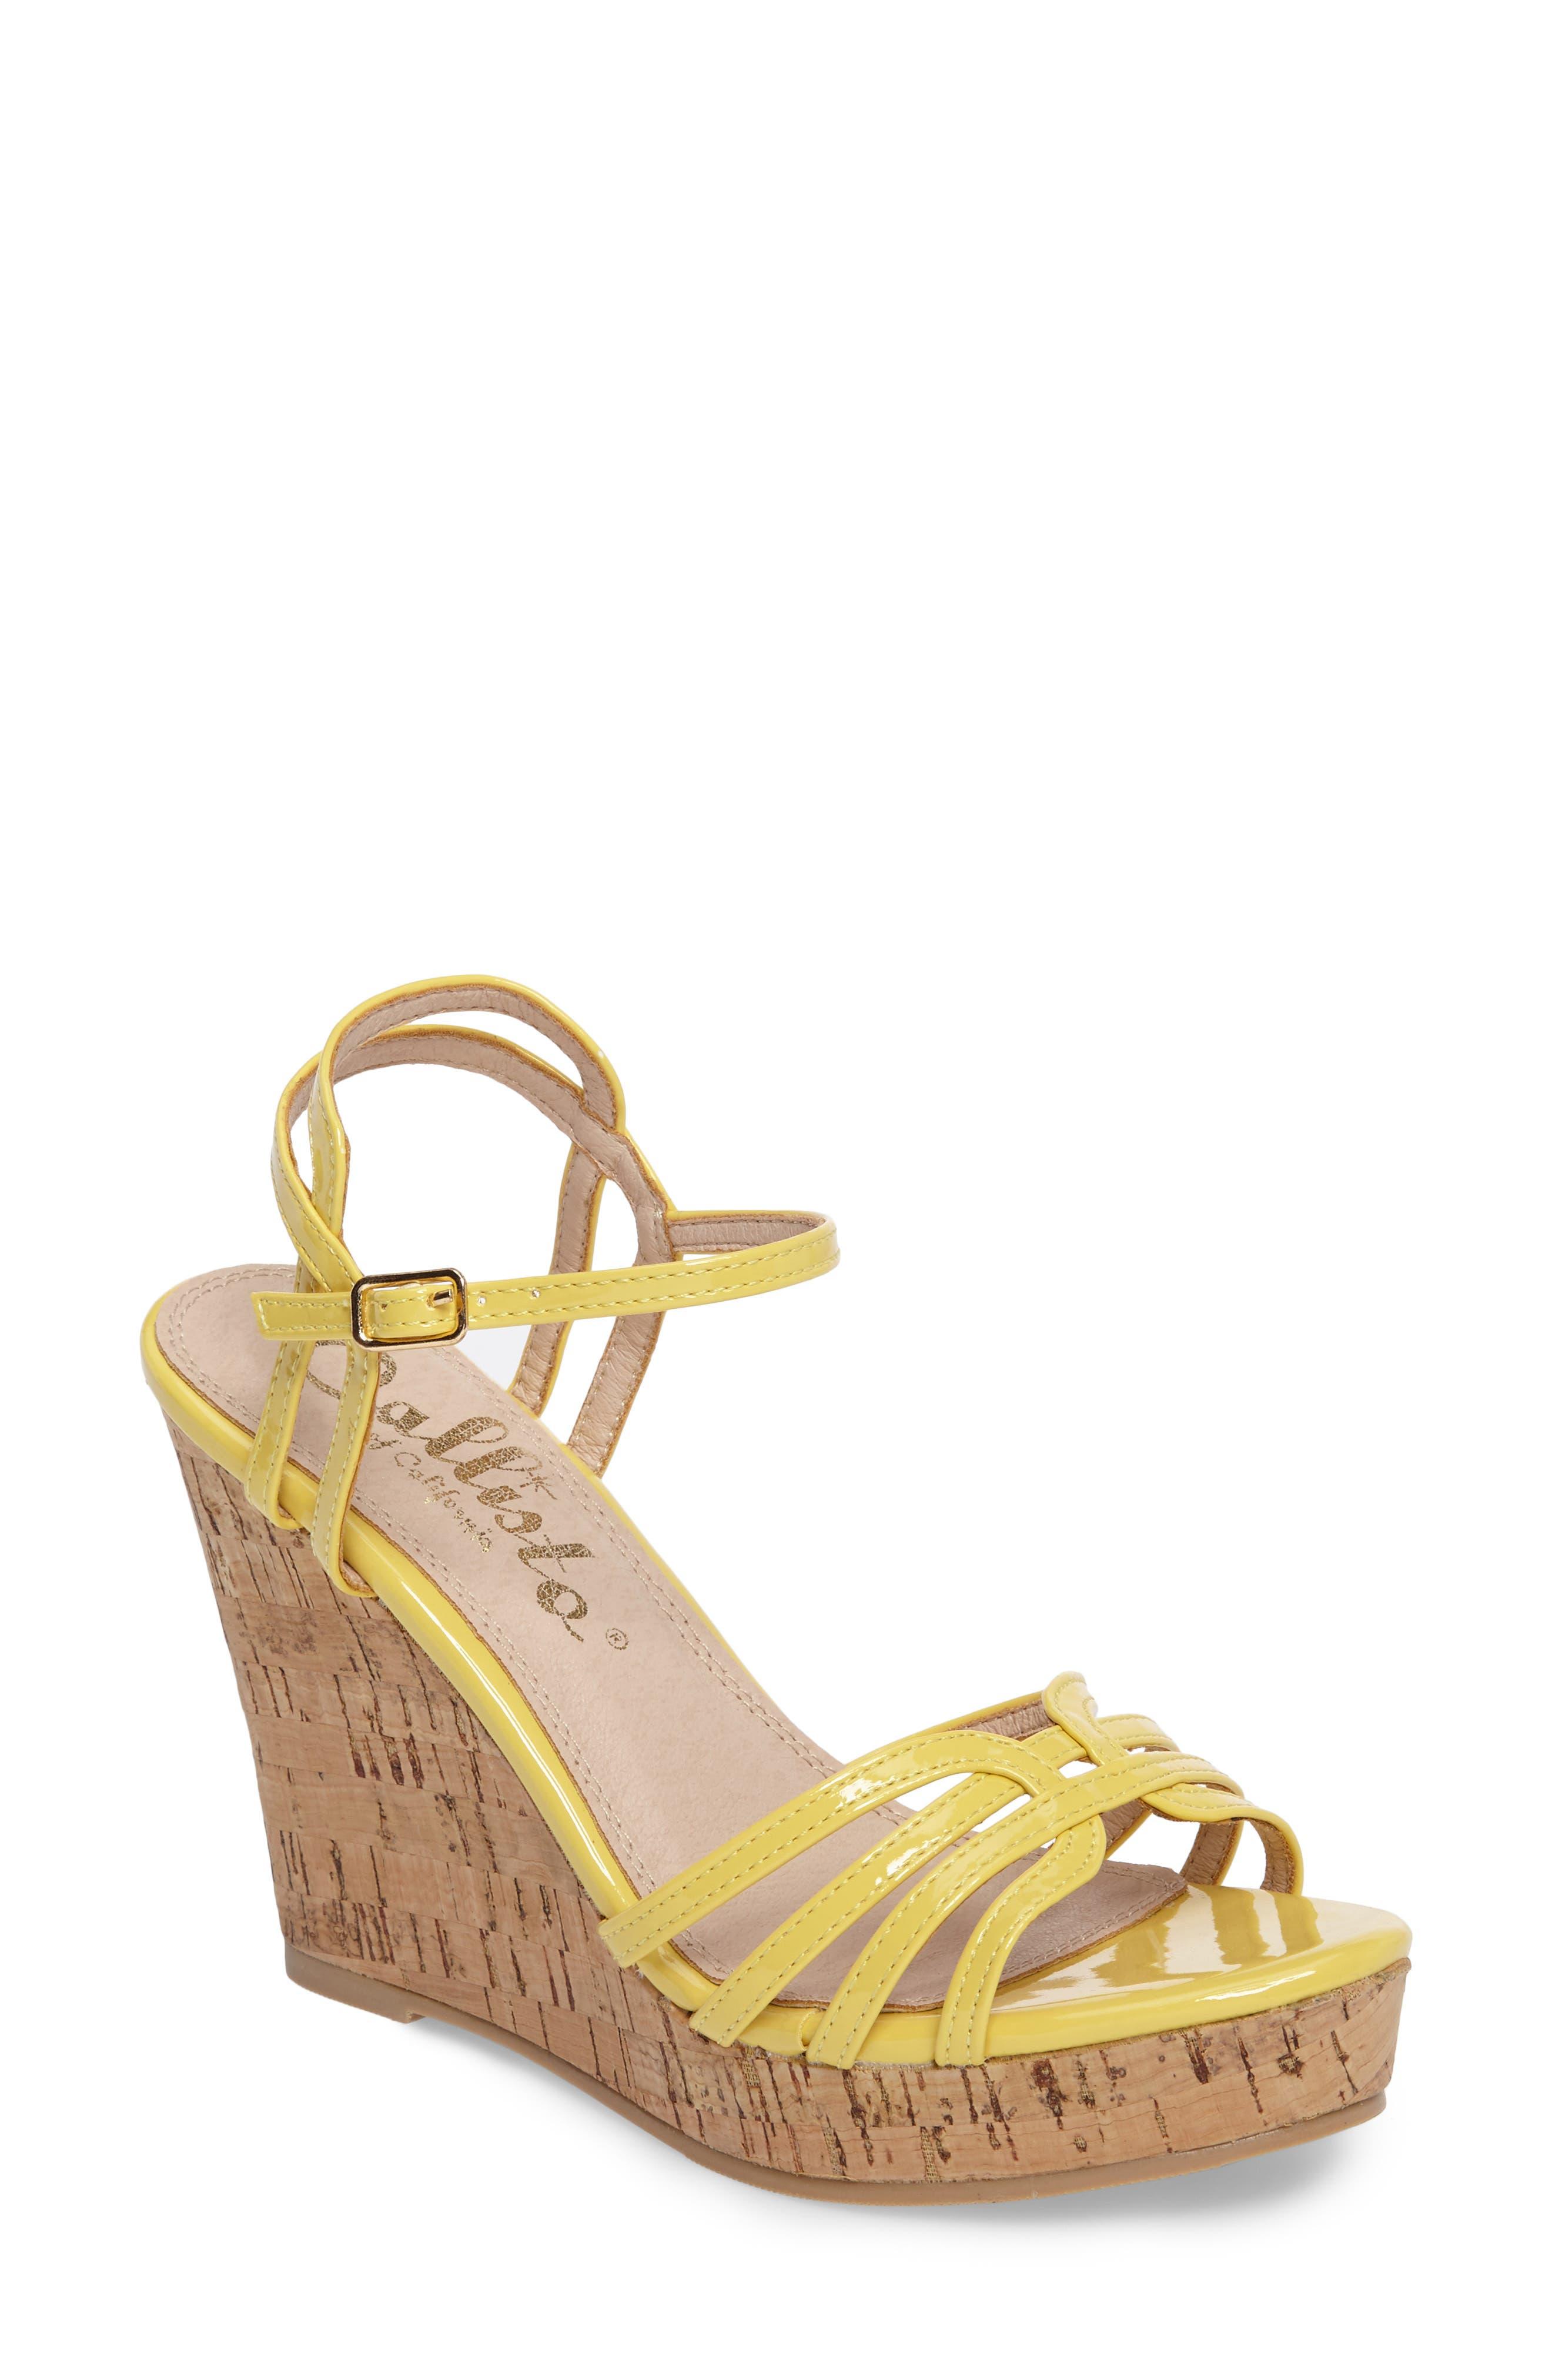 Oasis Platform Wedge Sandal,                             Main thumbnail 1, color,                             Yellow Synthetic